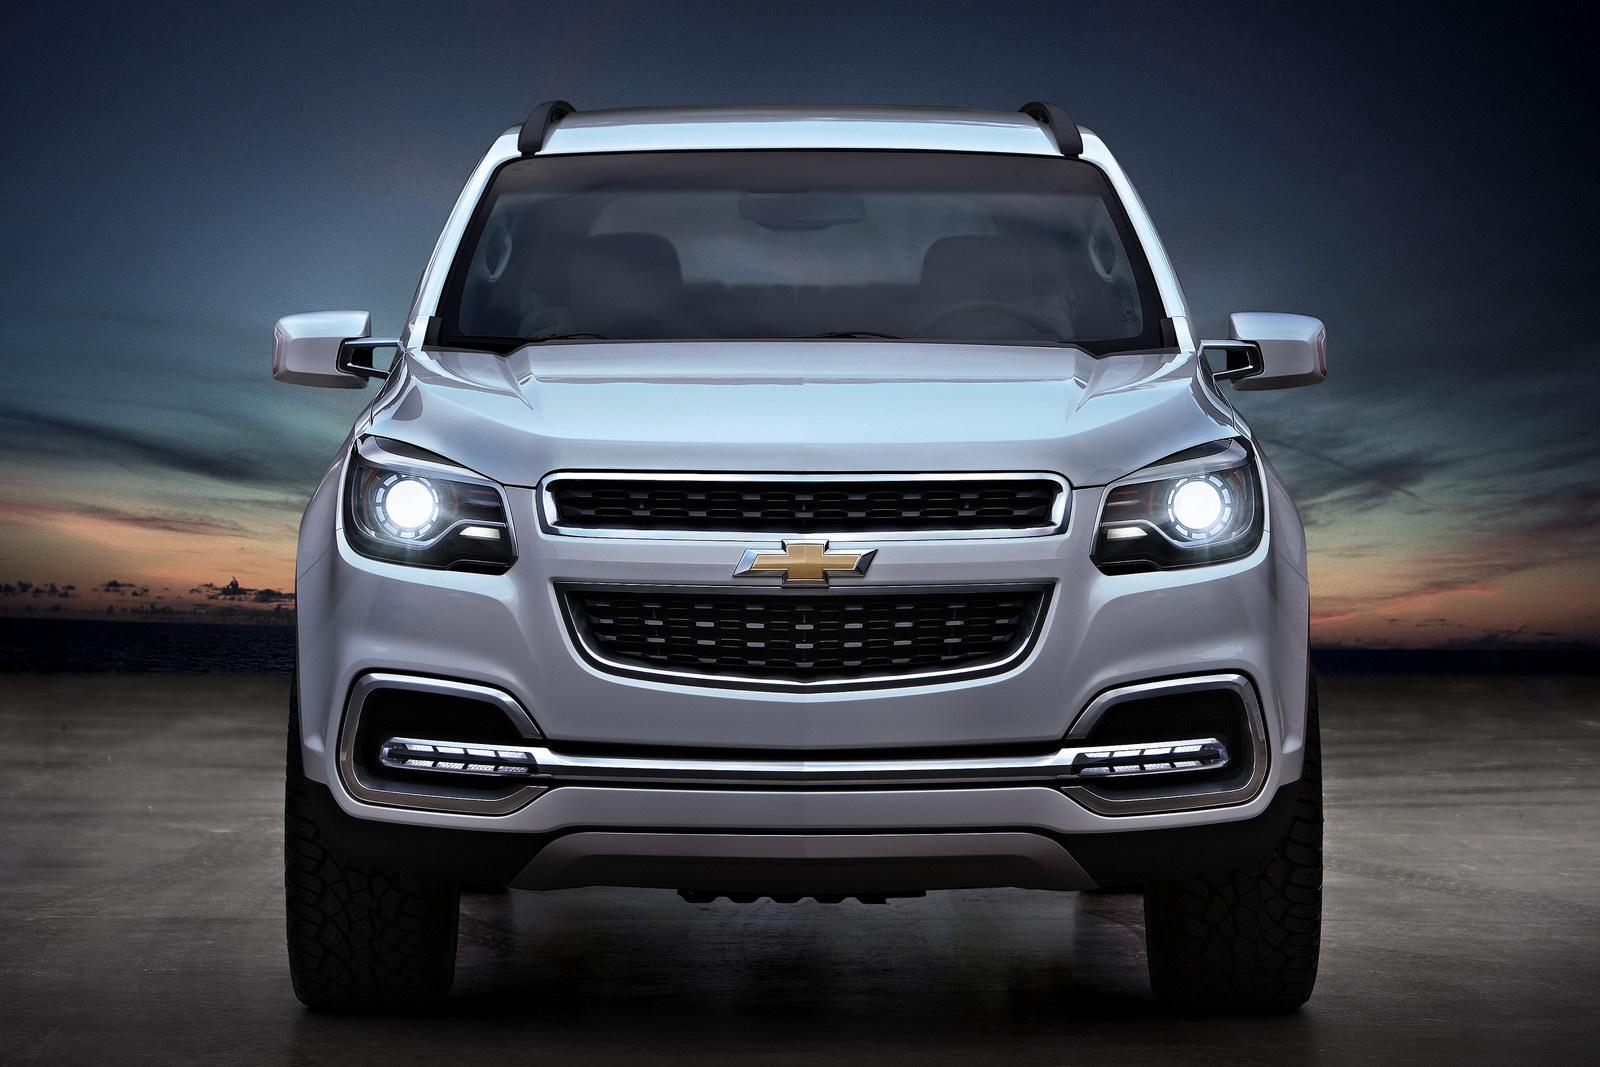 Hasil gambar untuk All New Chevrolet Trailblazer